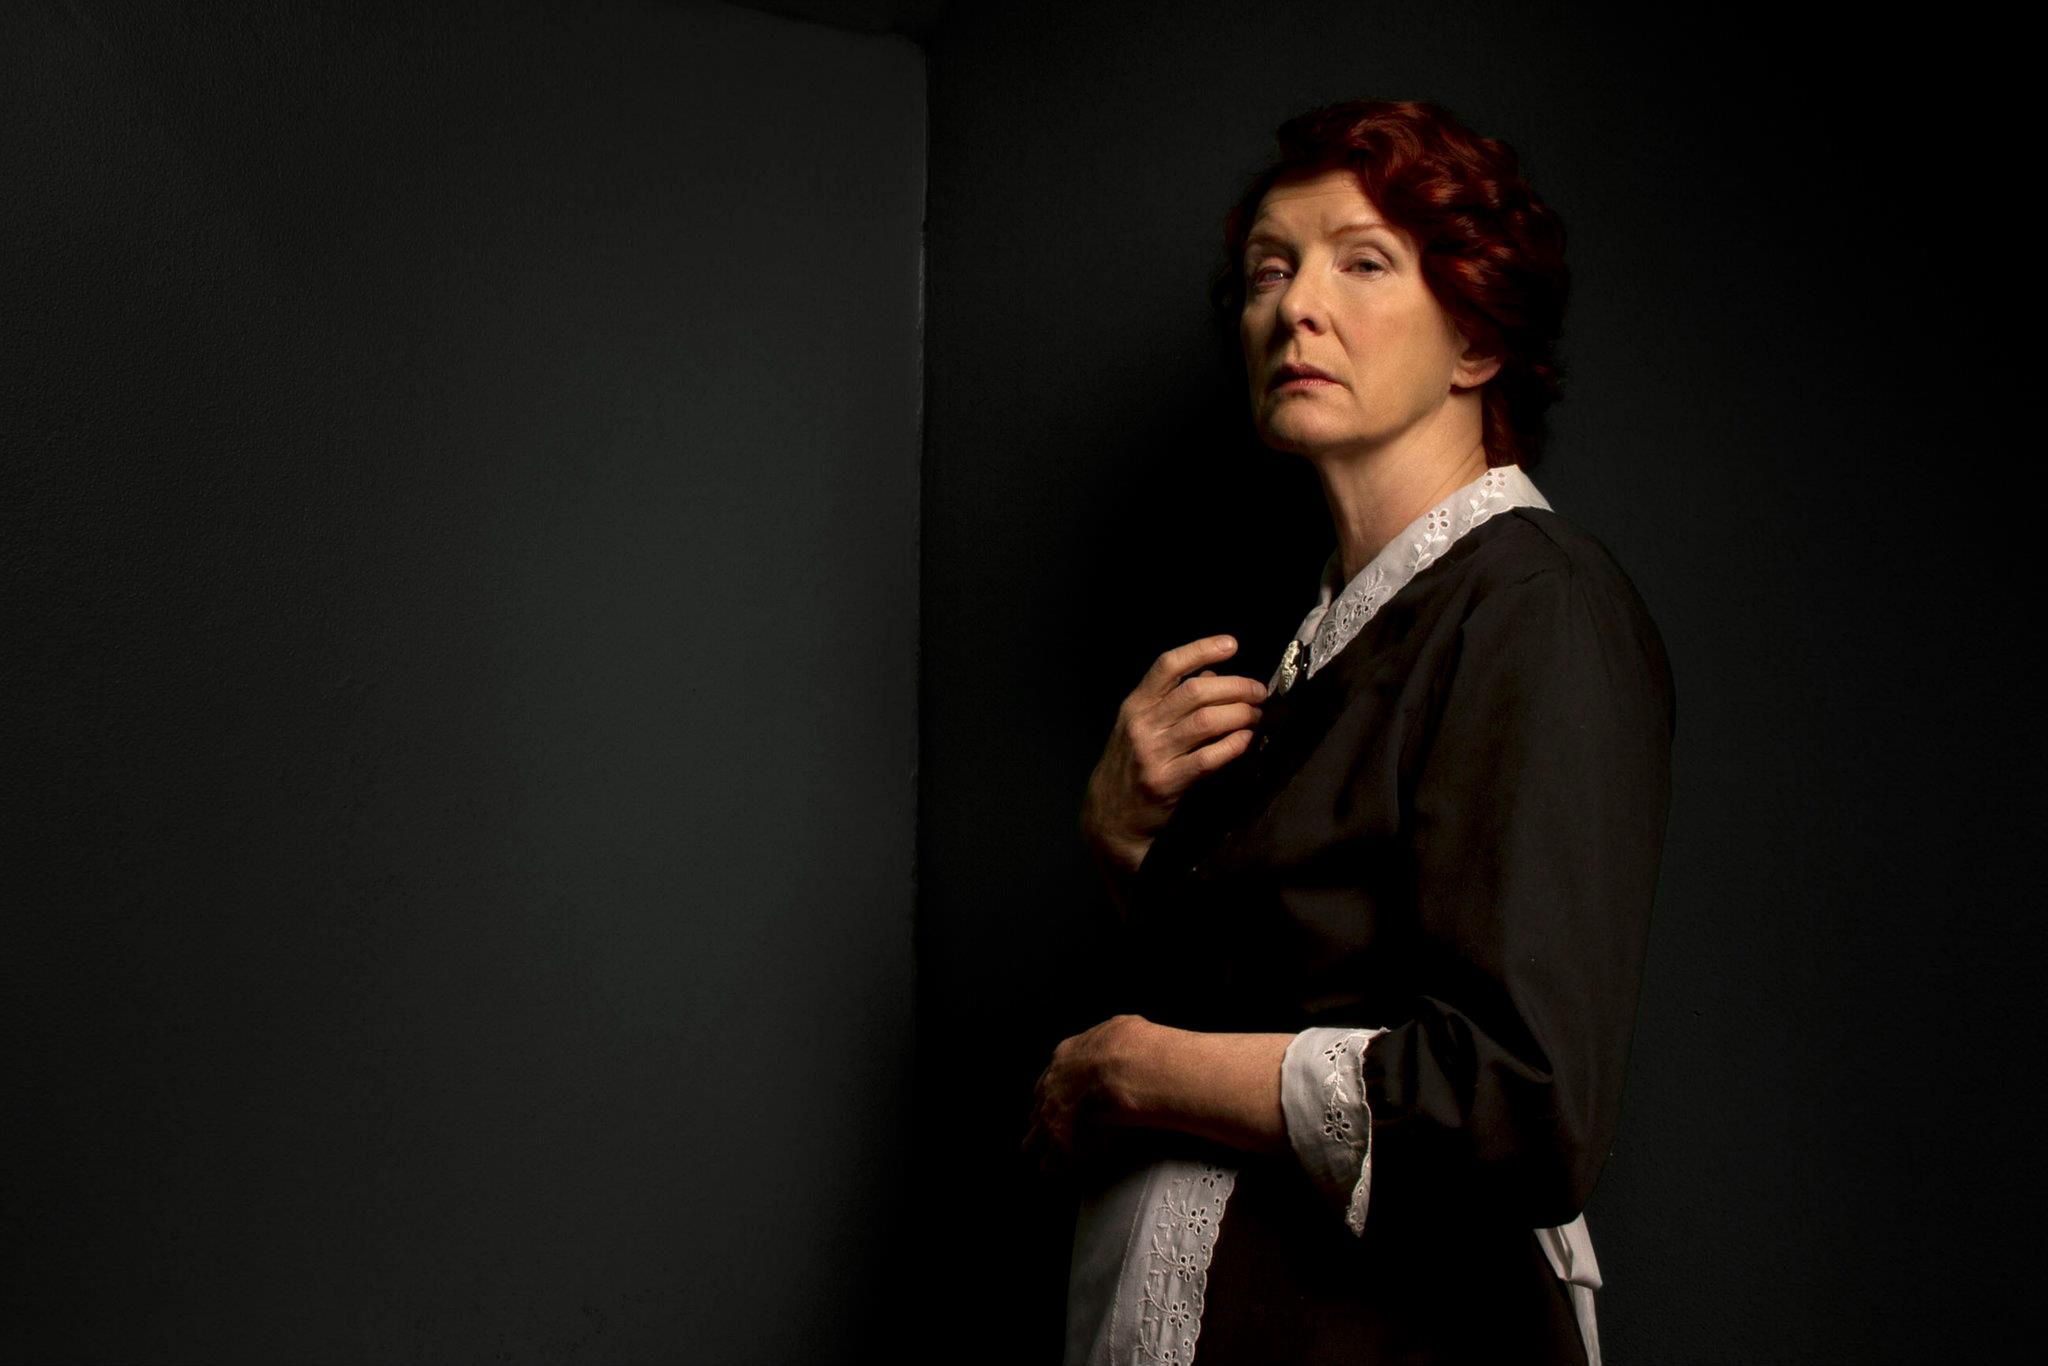 Frances Conroy ahs